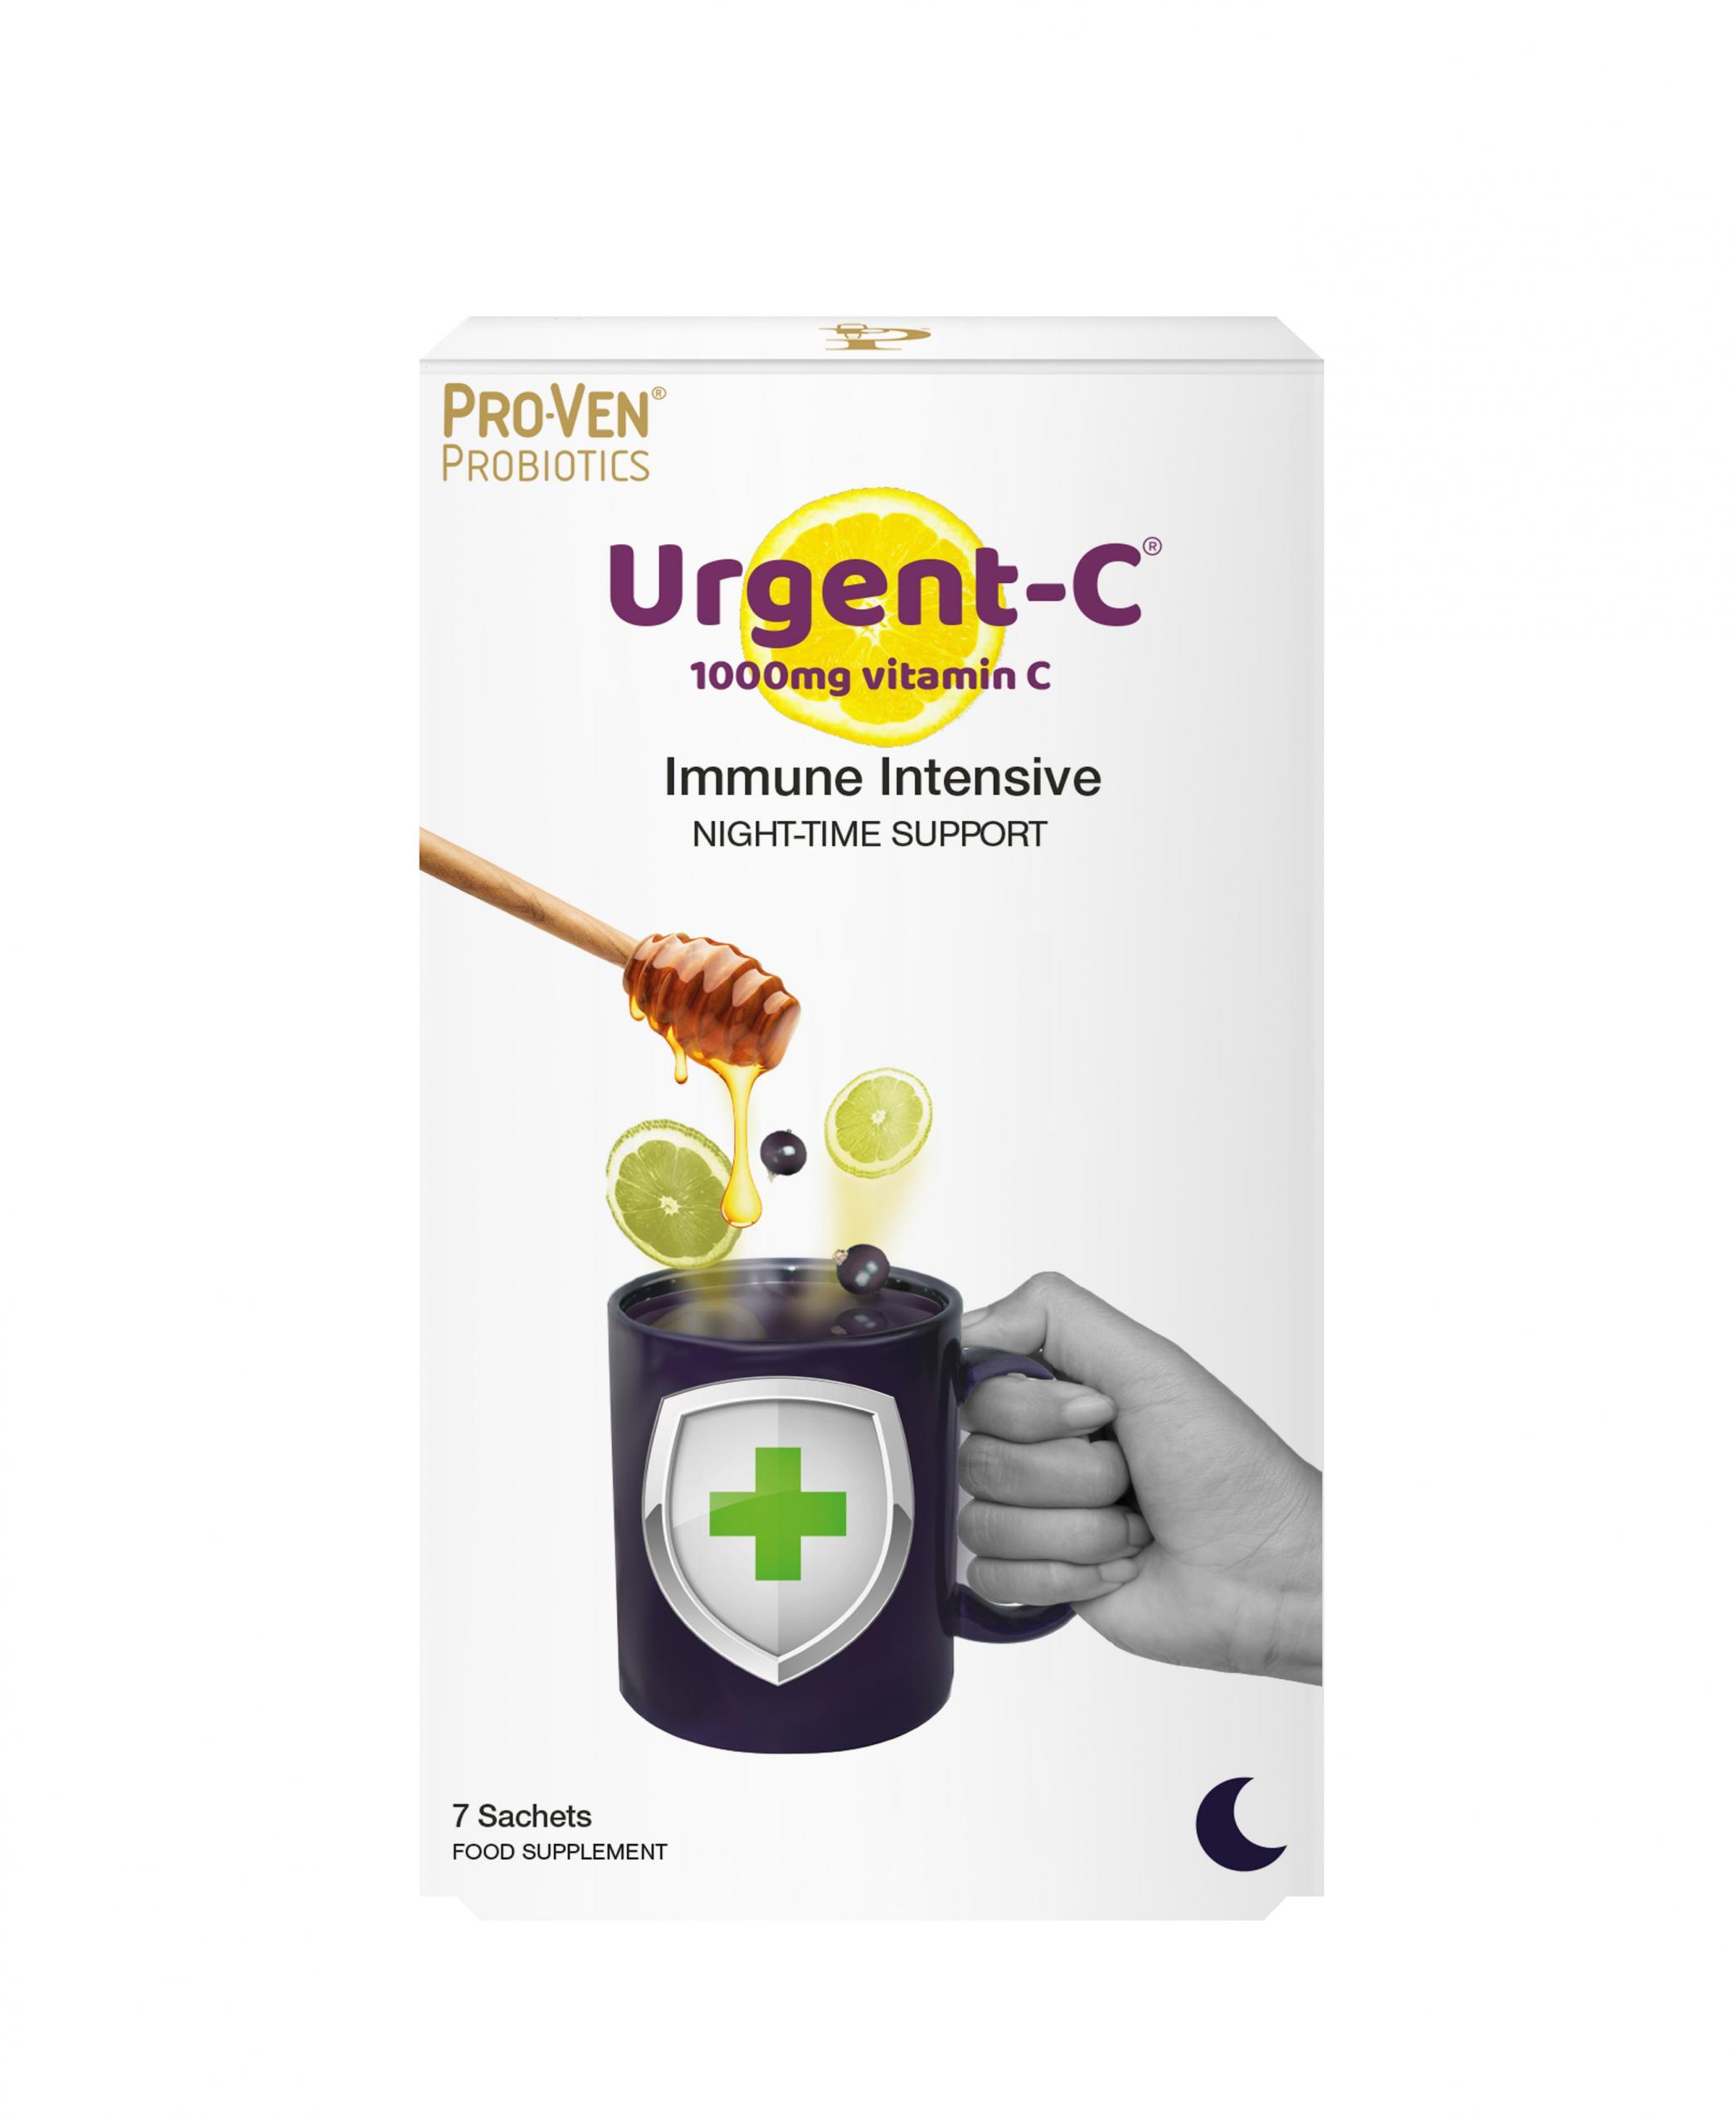 Urgent-C Immune Intensive Night-Time Support 7 Sachets